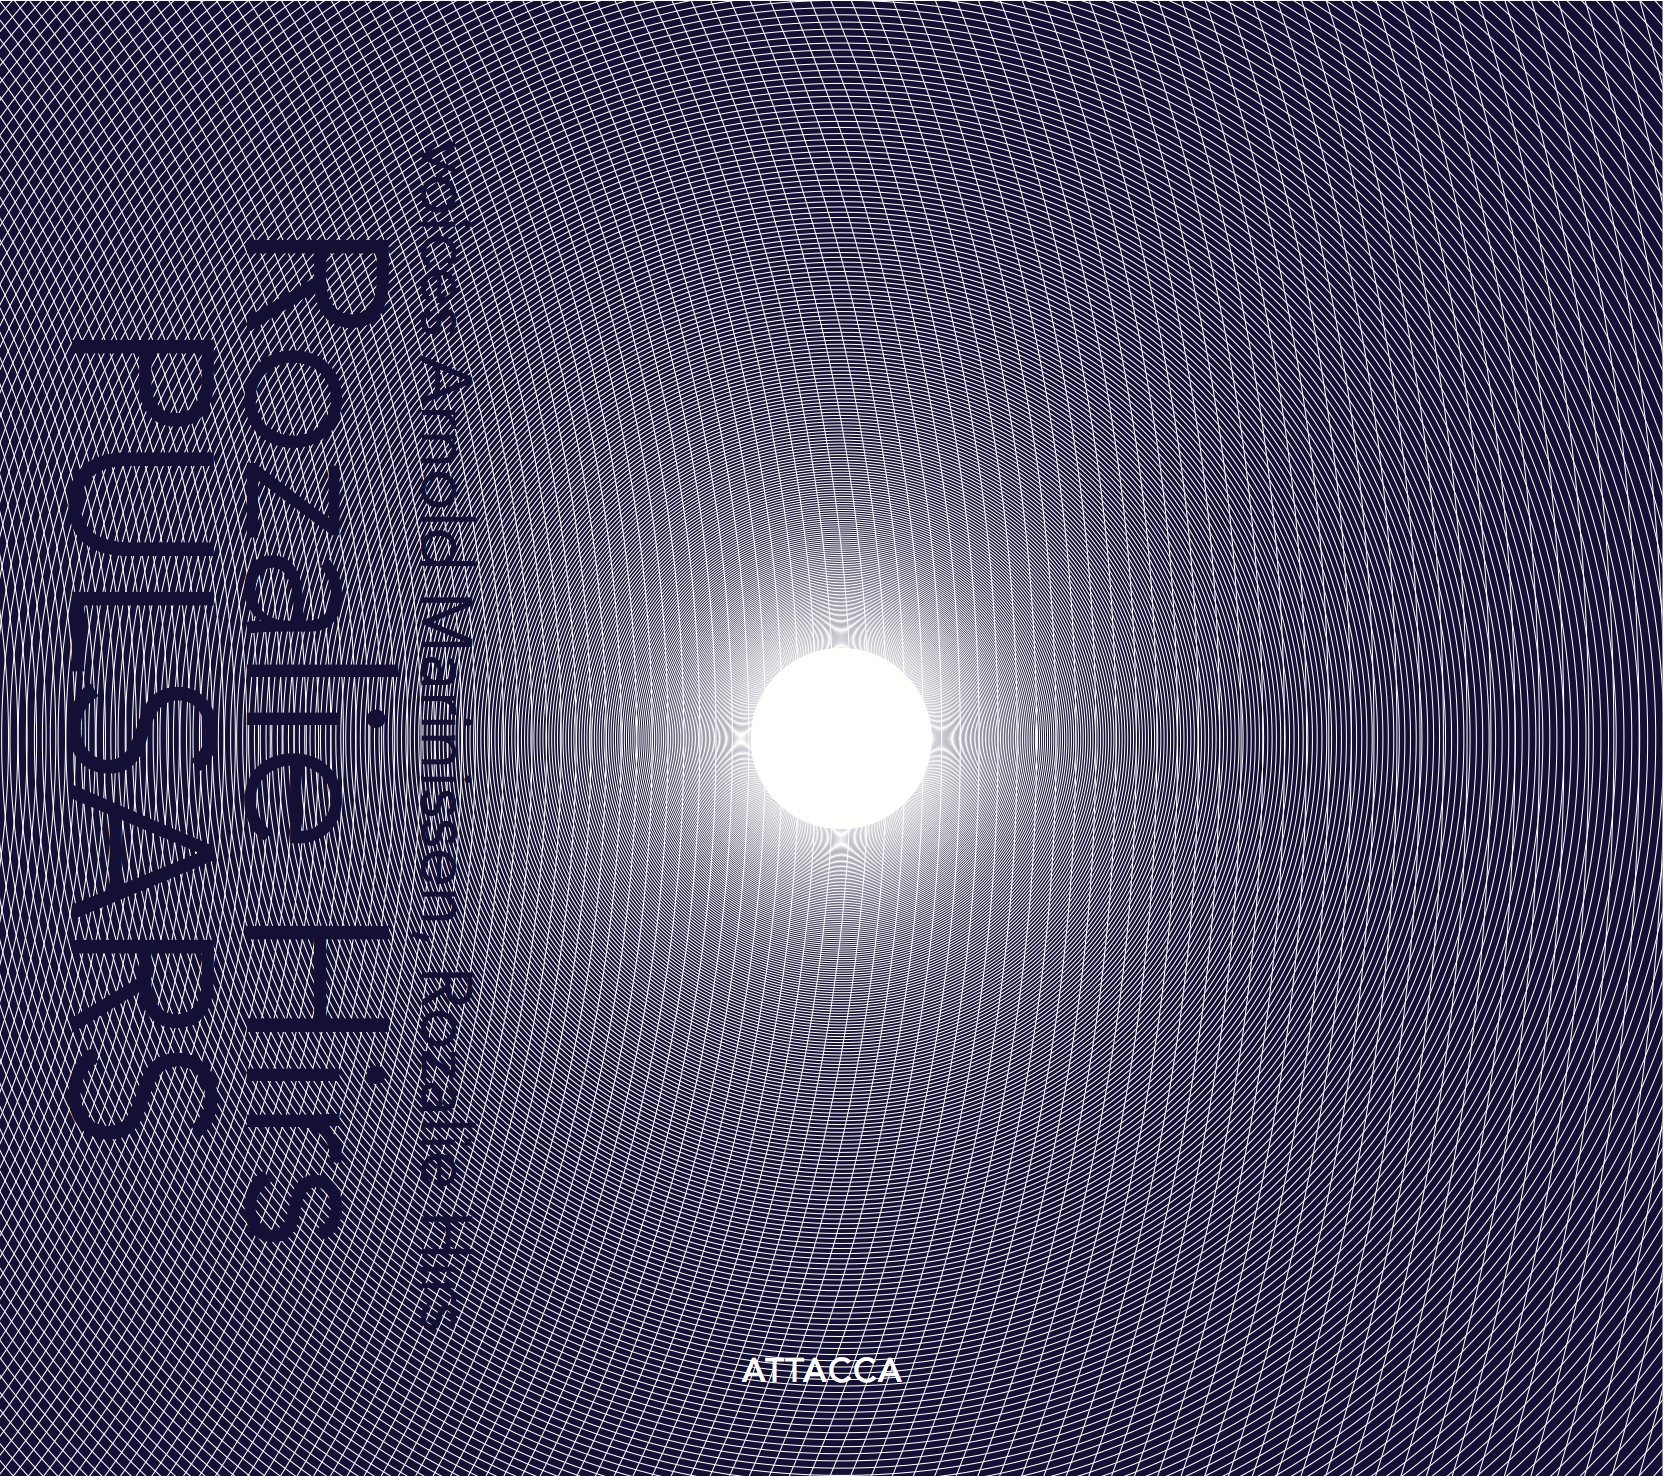 pulsars (2007), concertzender